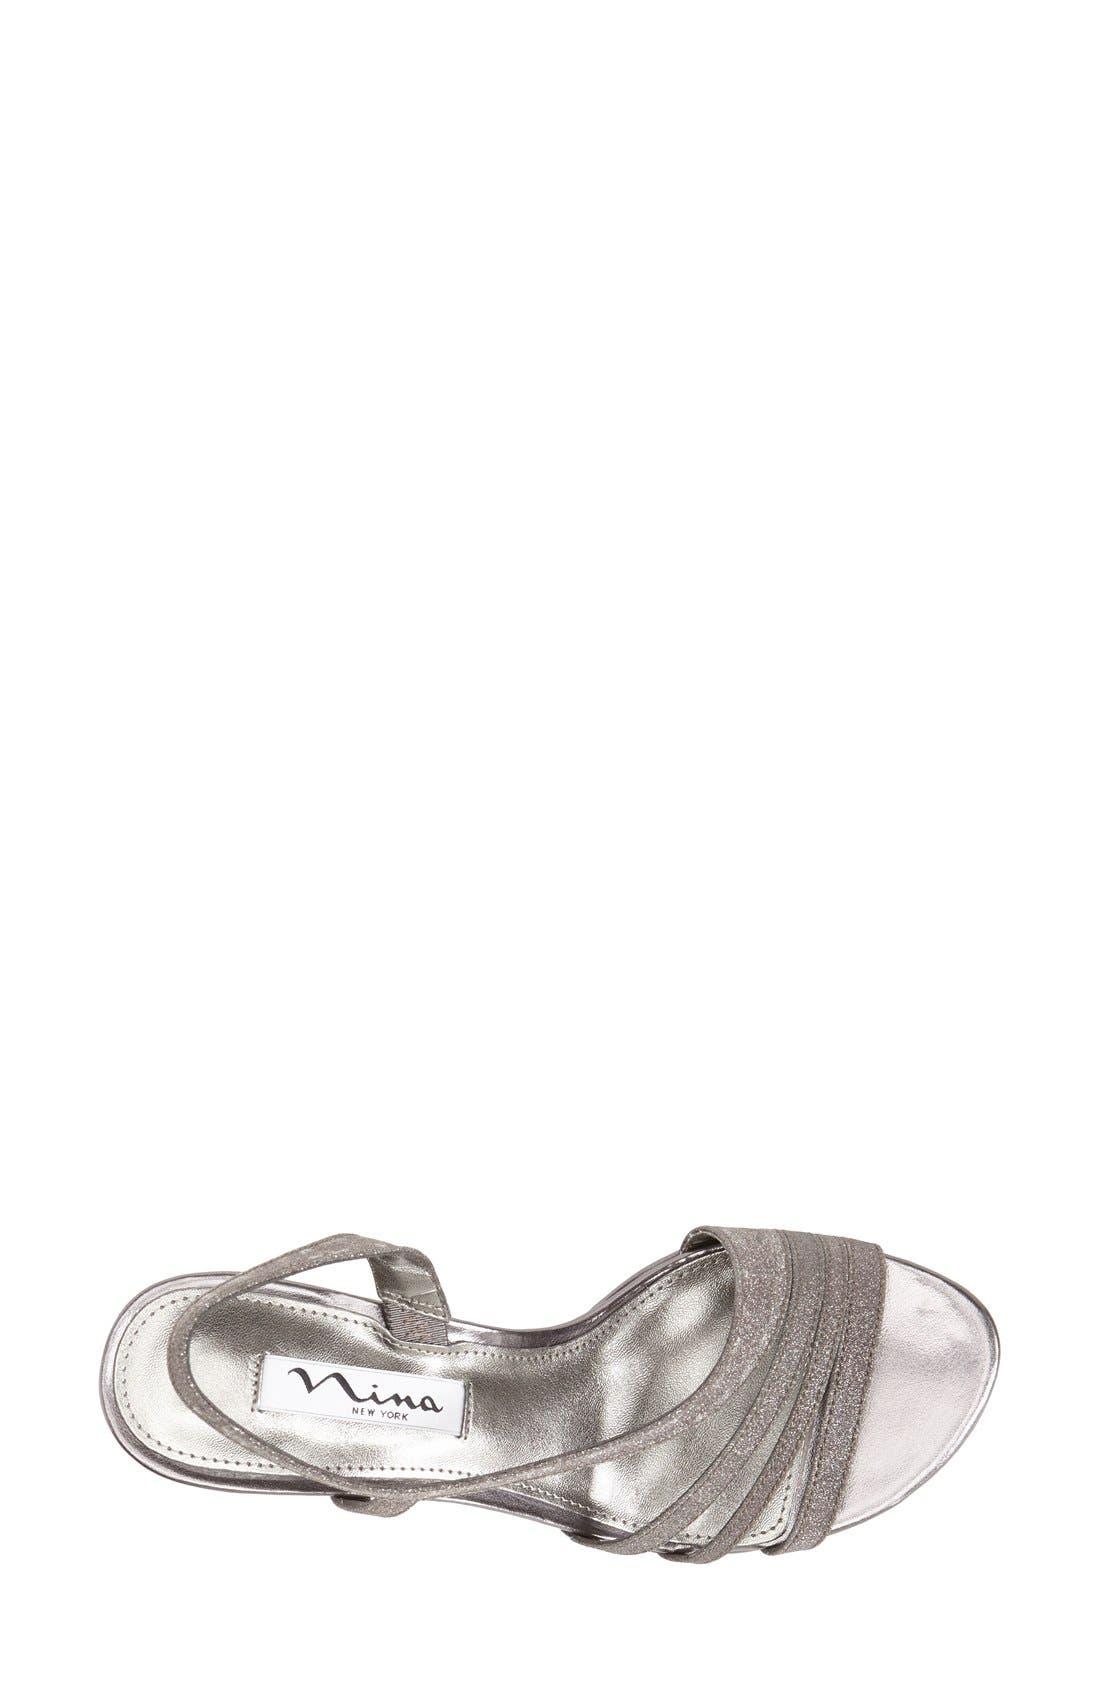 'Neely' Slingback Platform Sandal,                             Alternate thumbnail 4, color,                             CHARCOAL